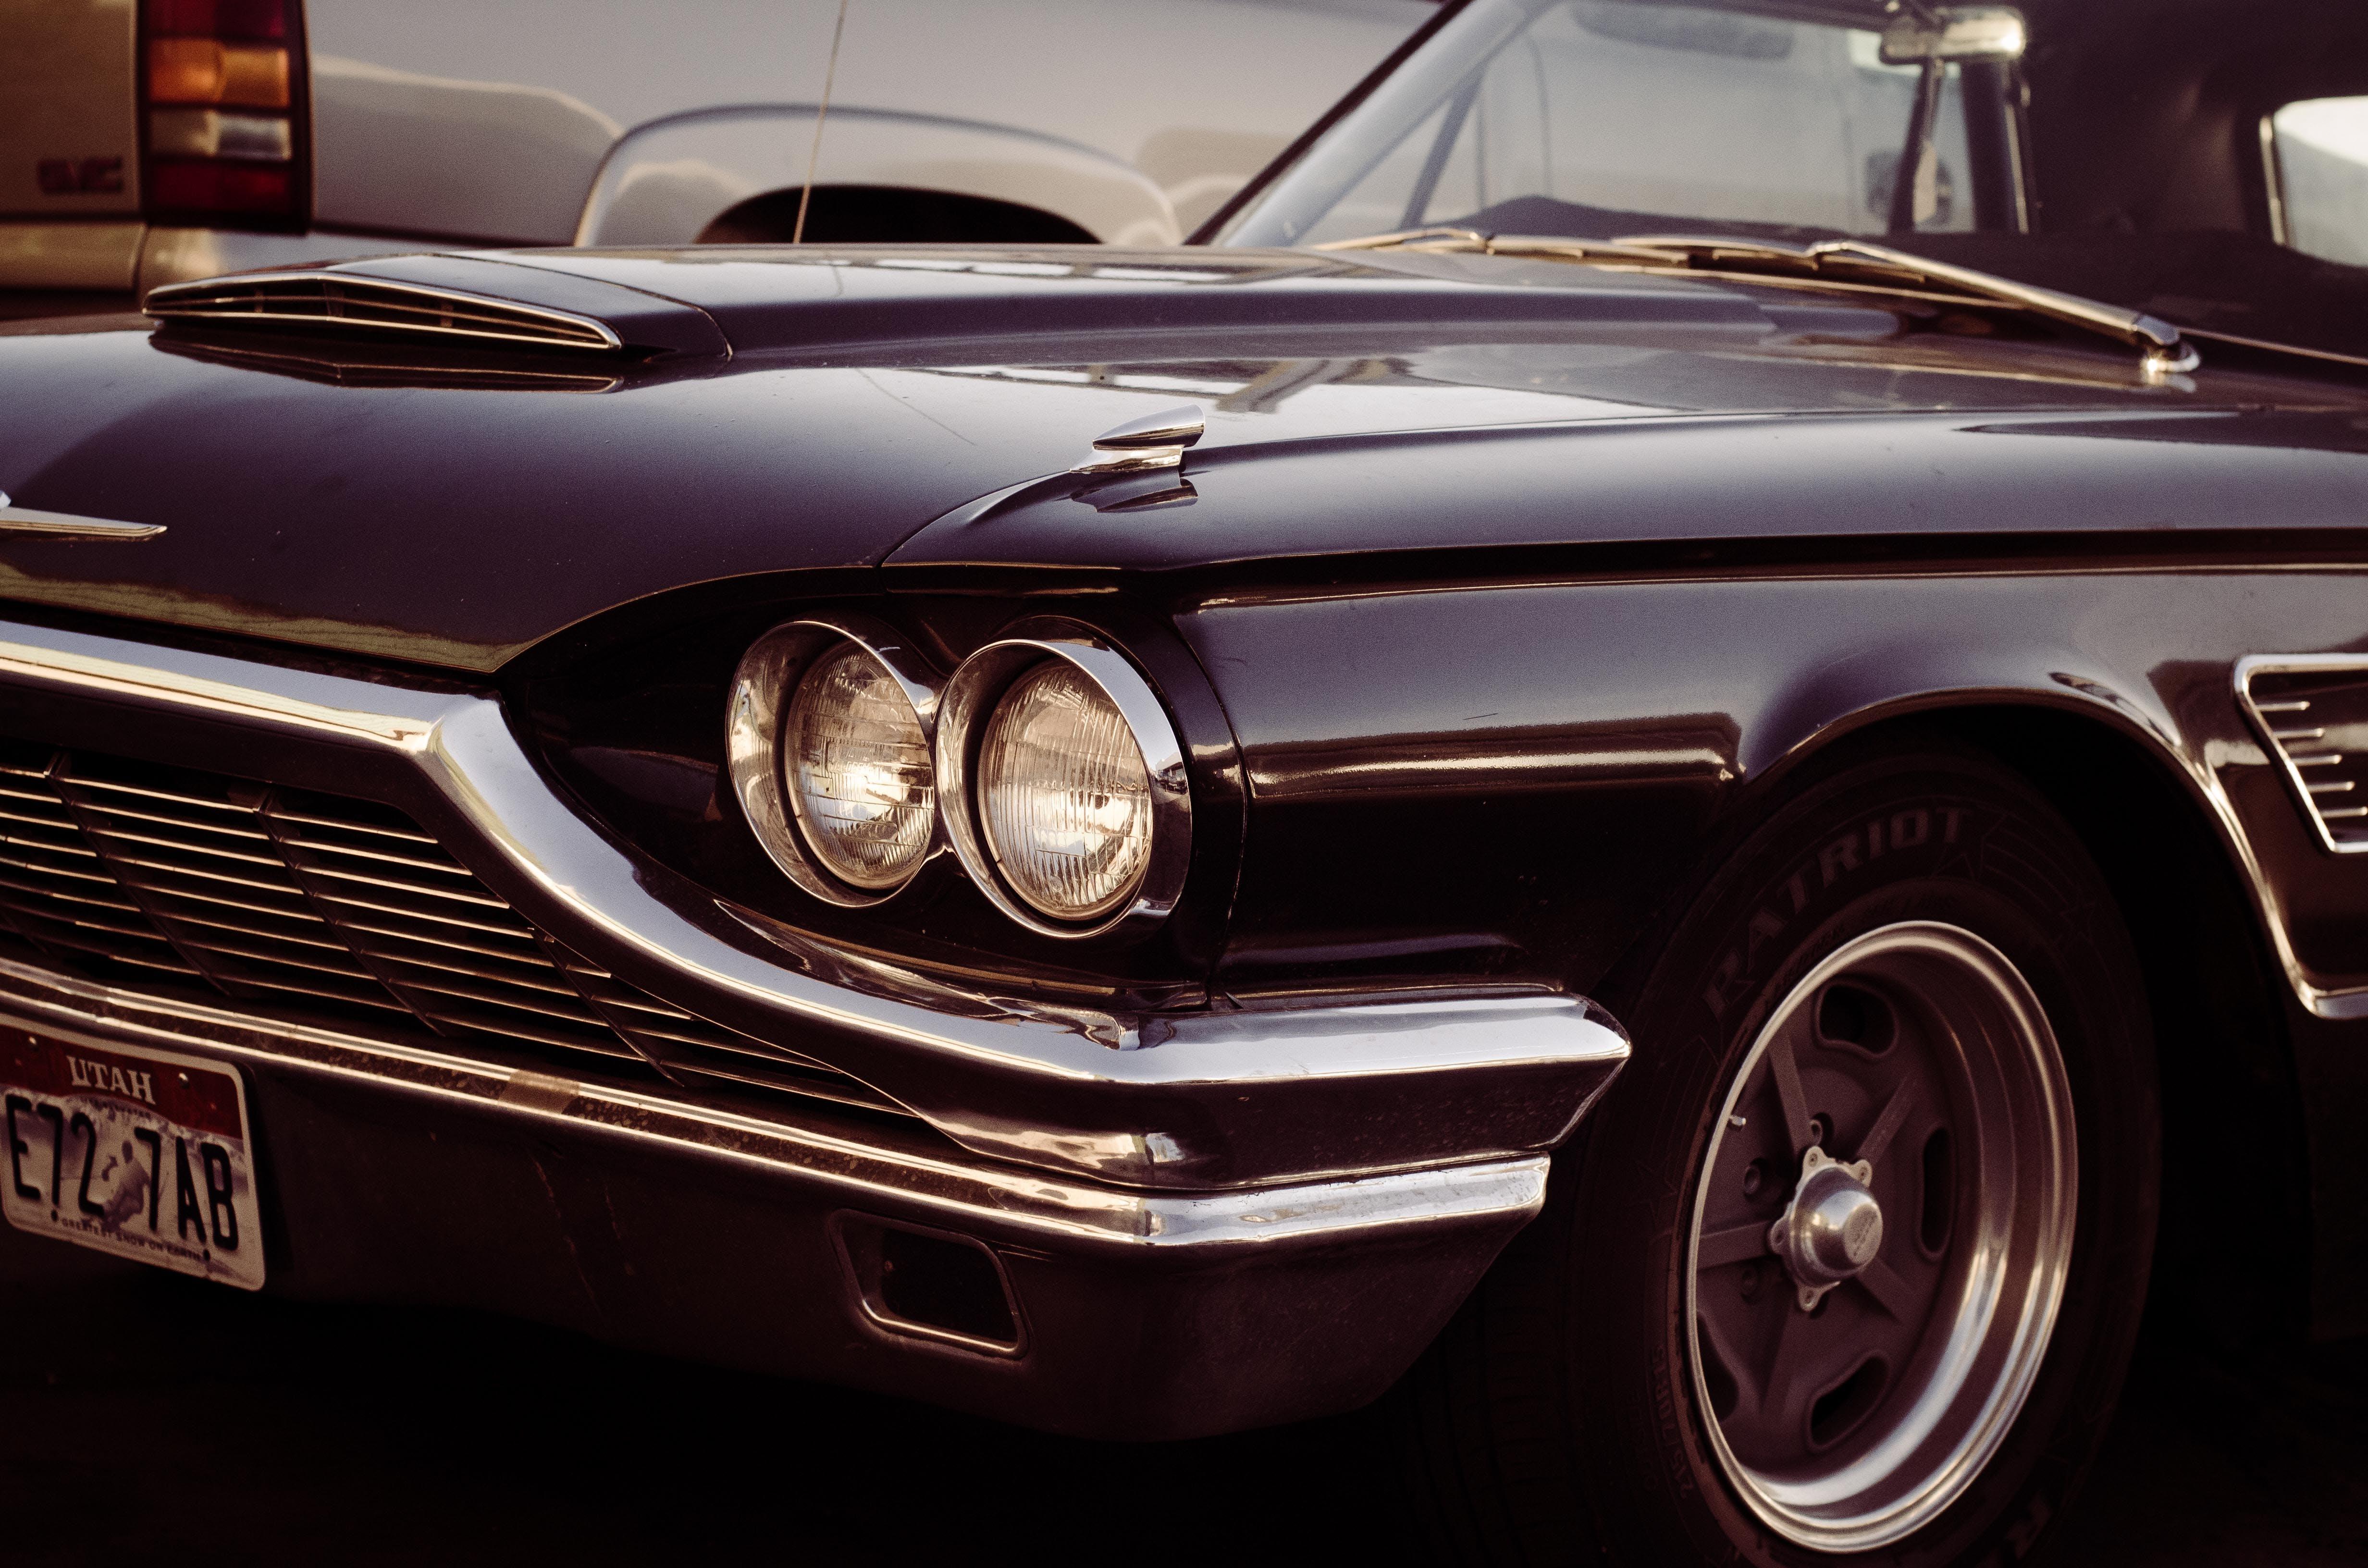 Free stock photo of black car, blackbird, car